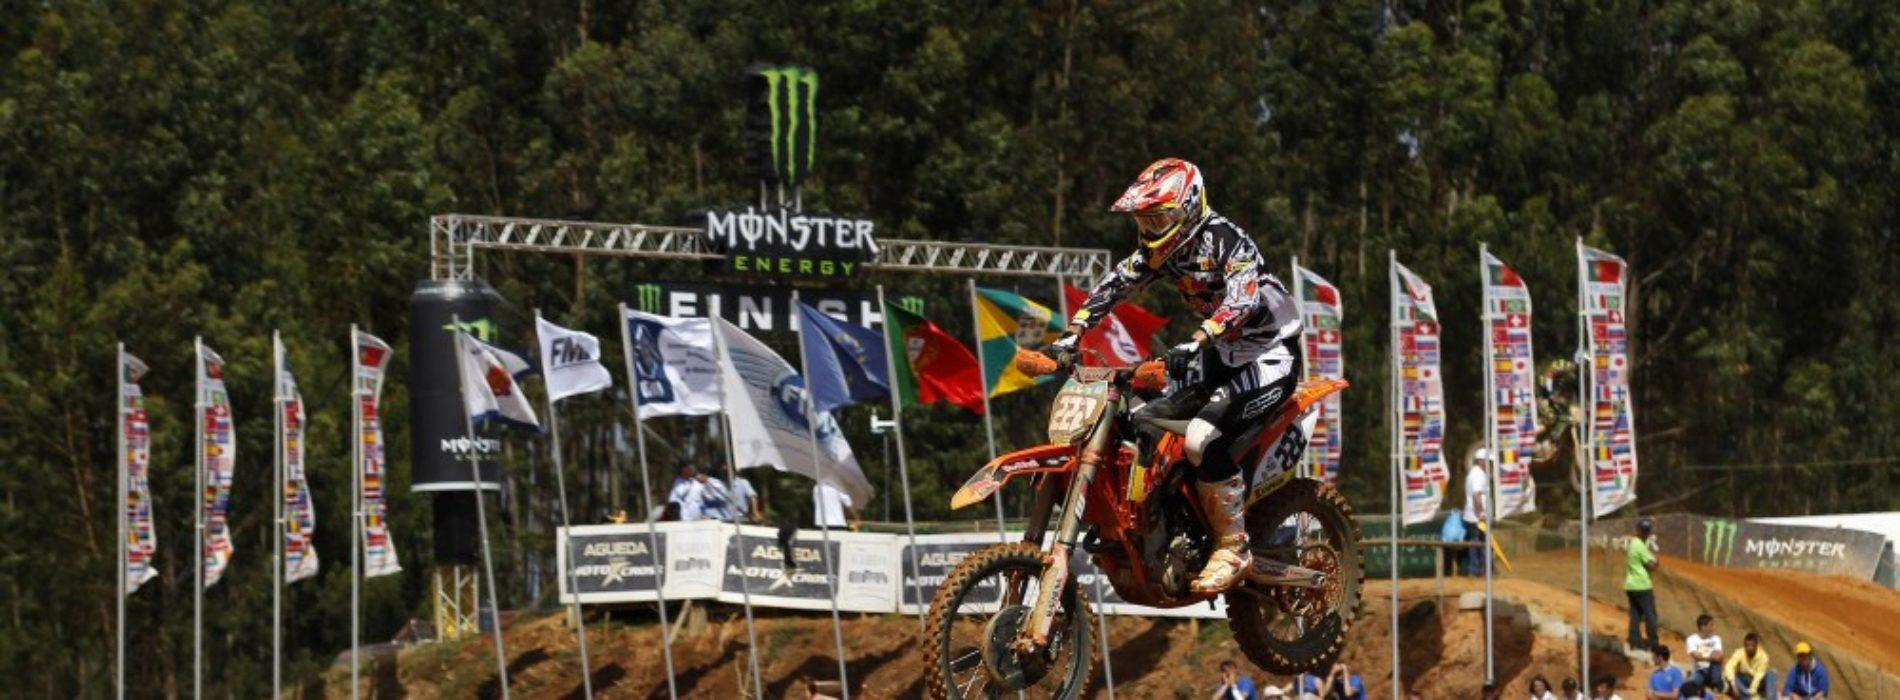 Mundial MXGP Portugal 2017 já tem bilhetes à venda